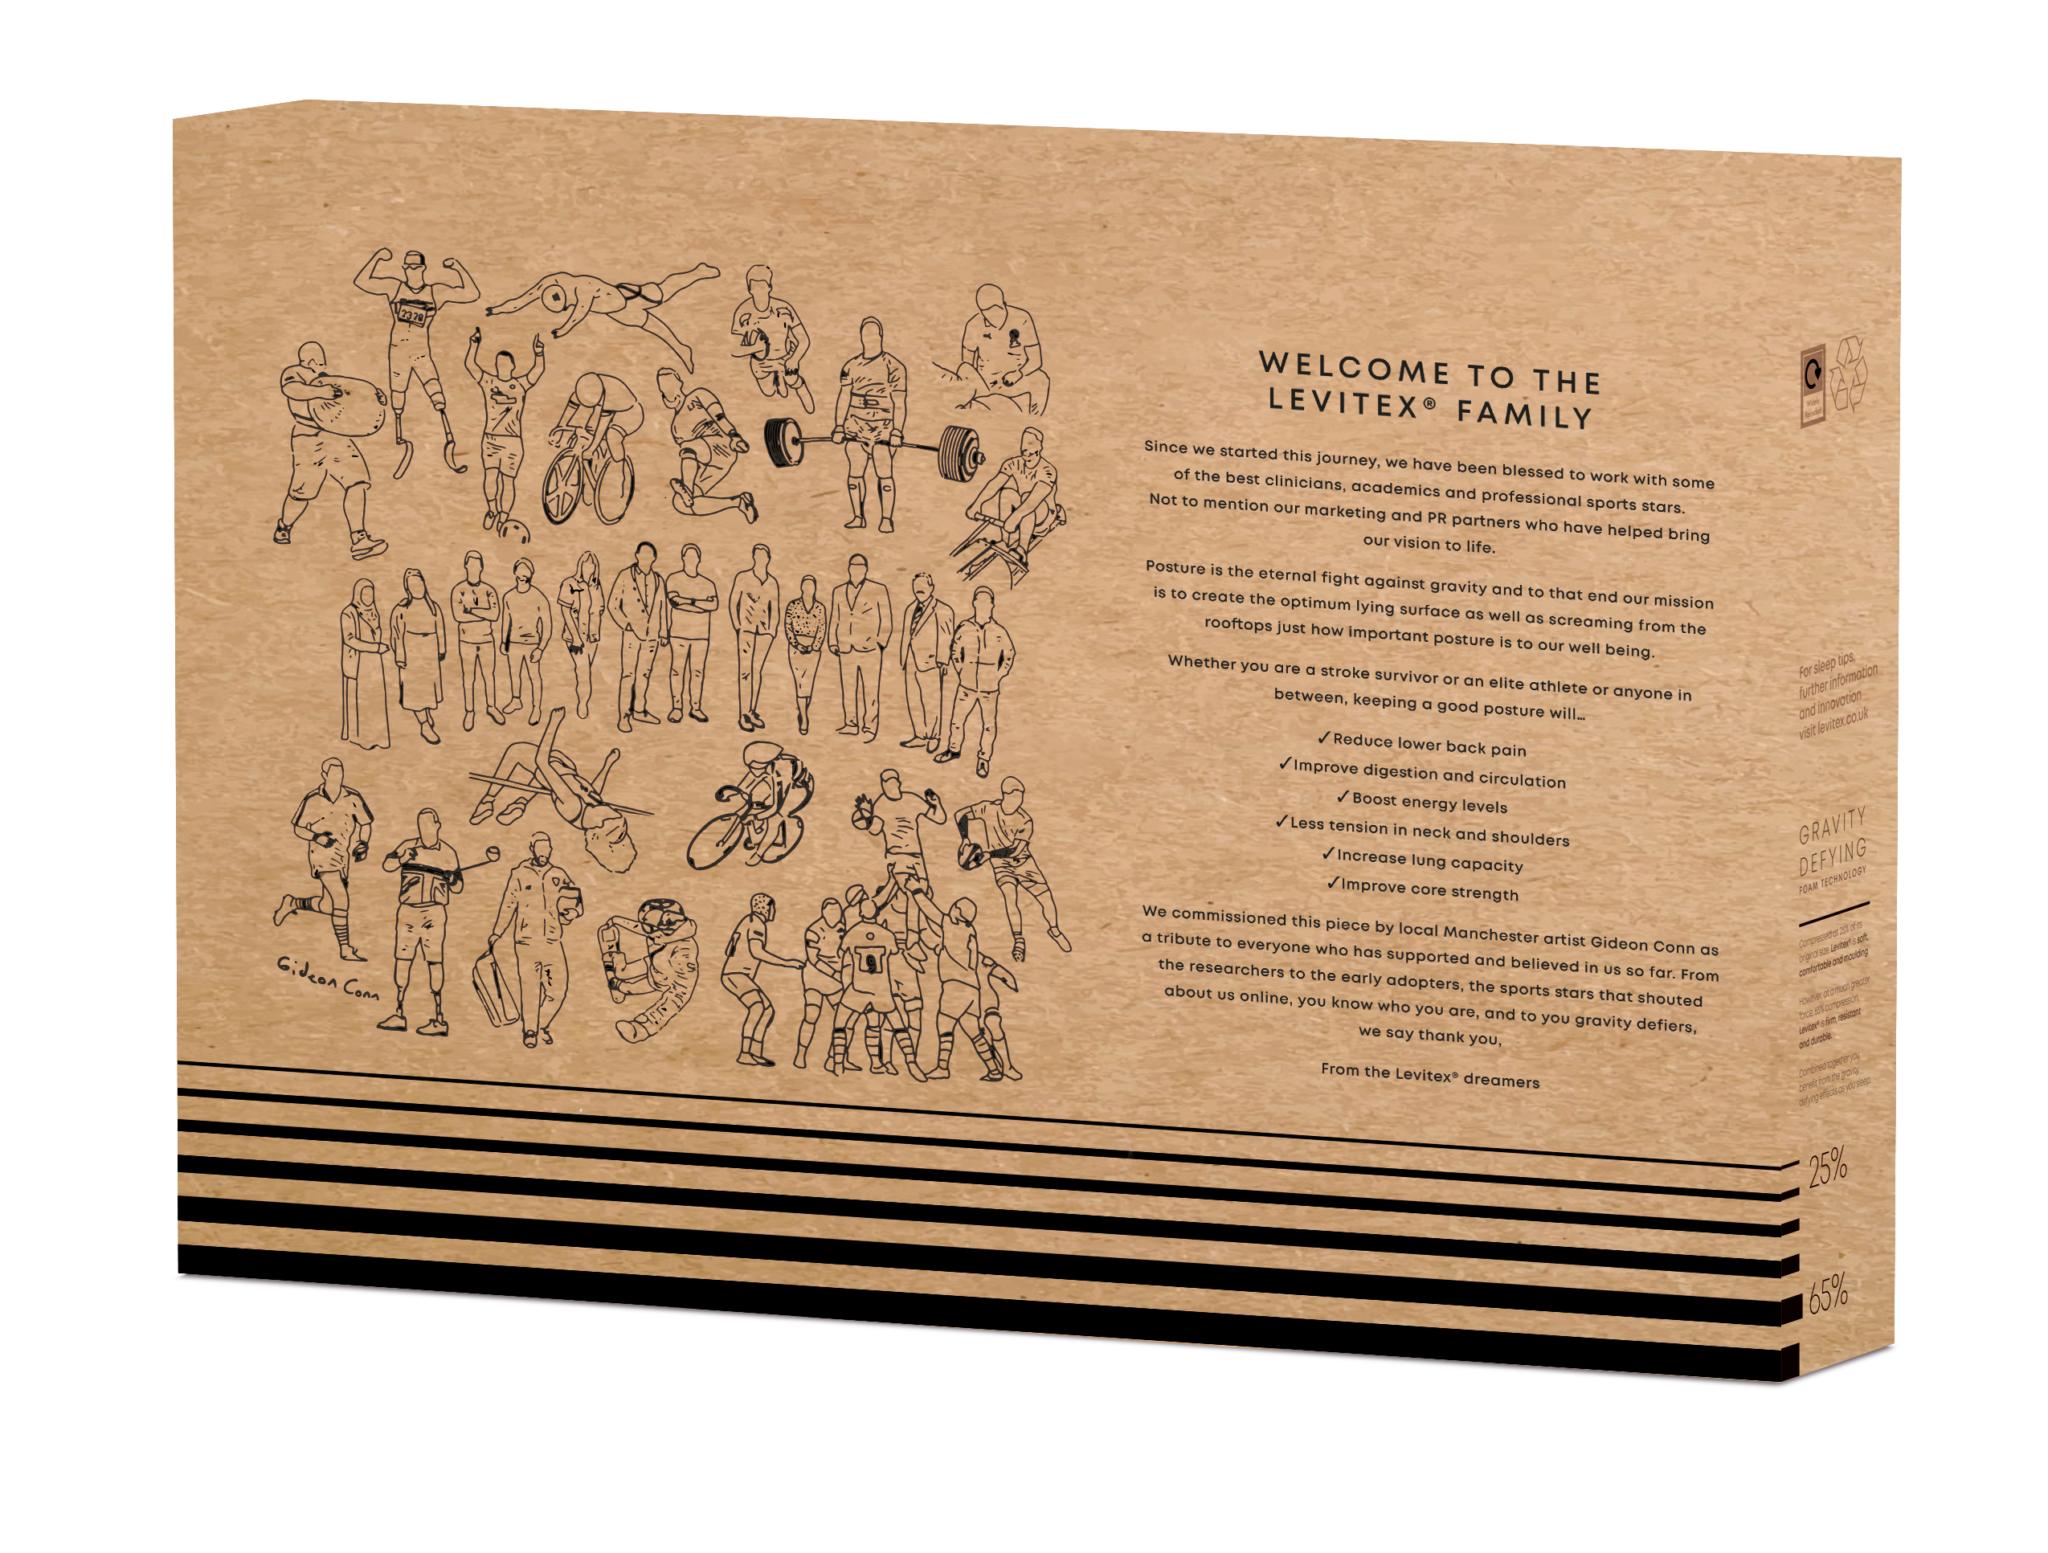 levitex packaging box